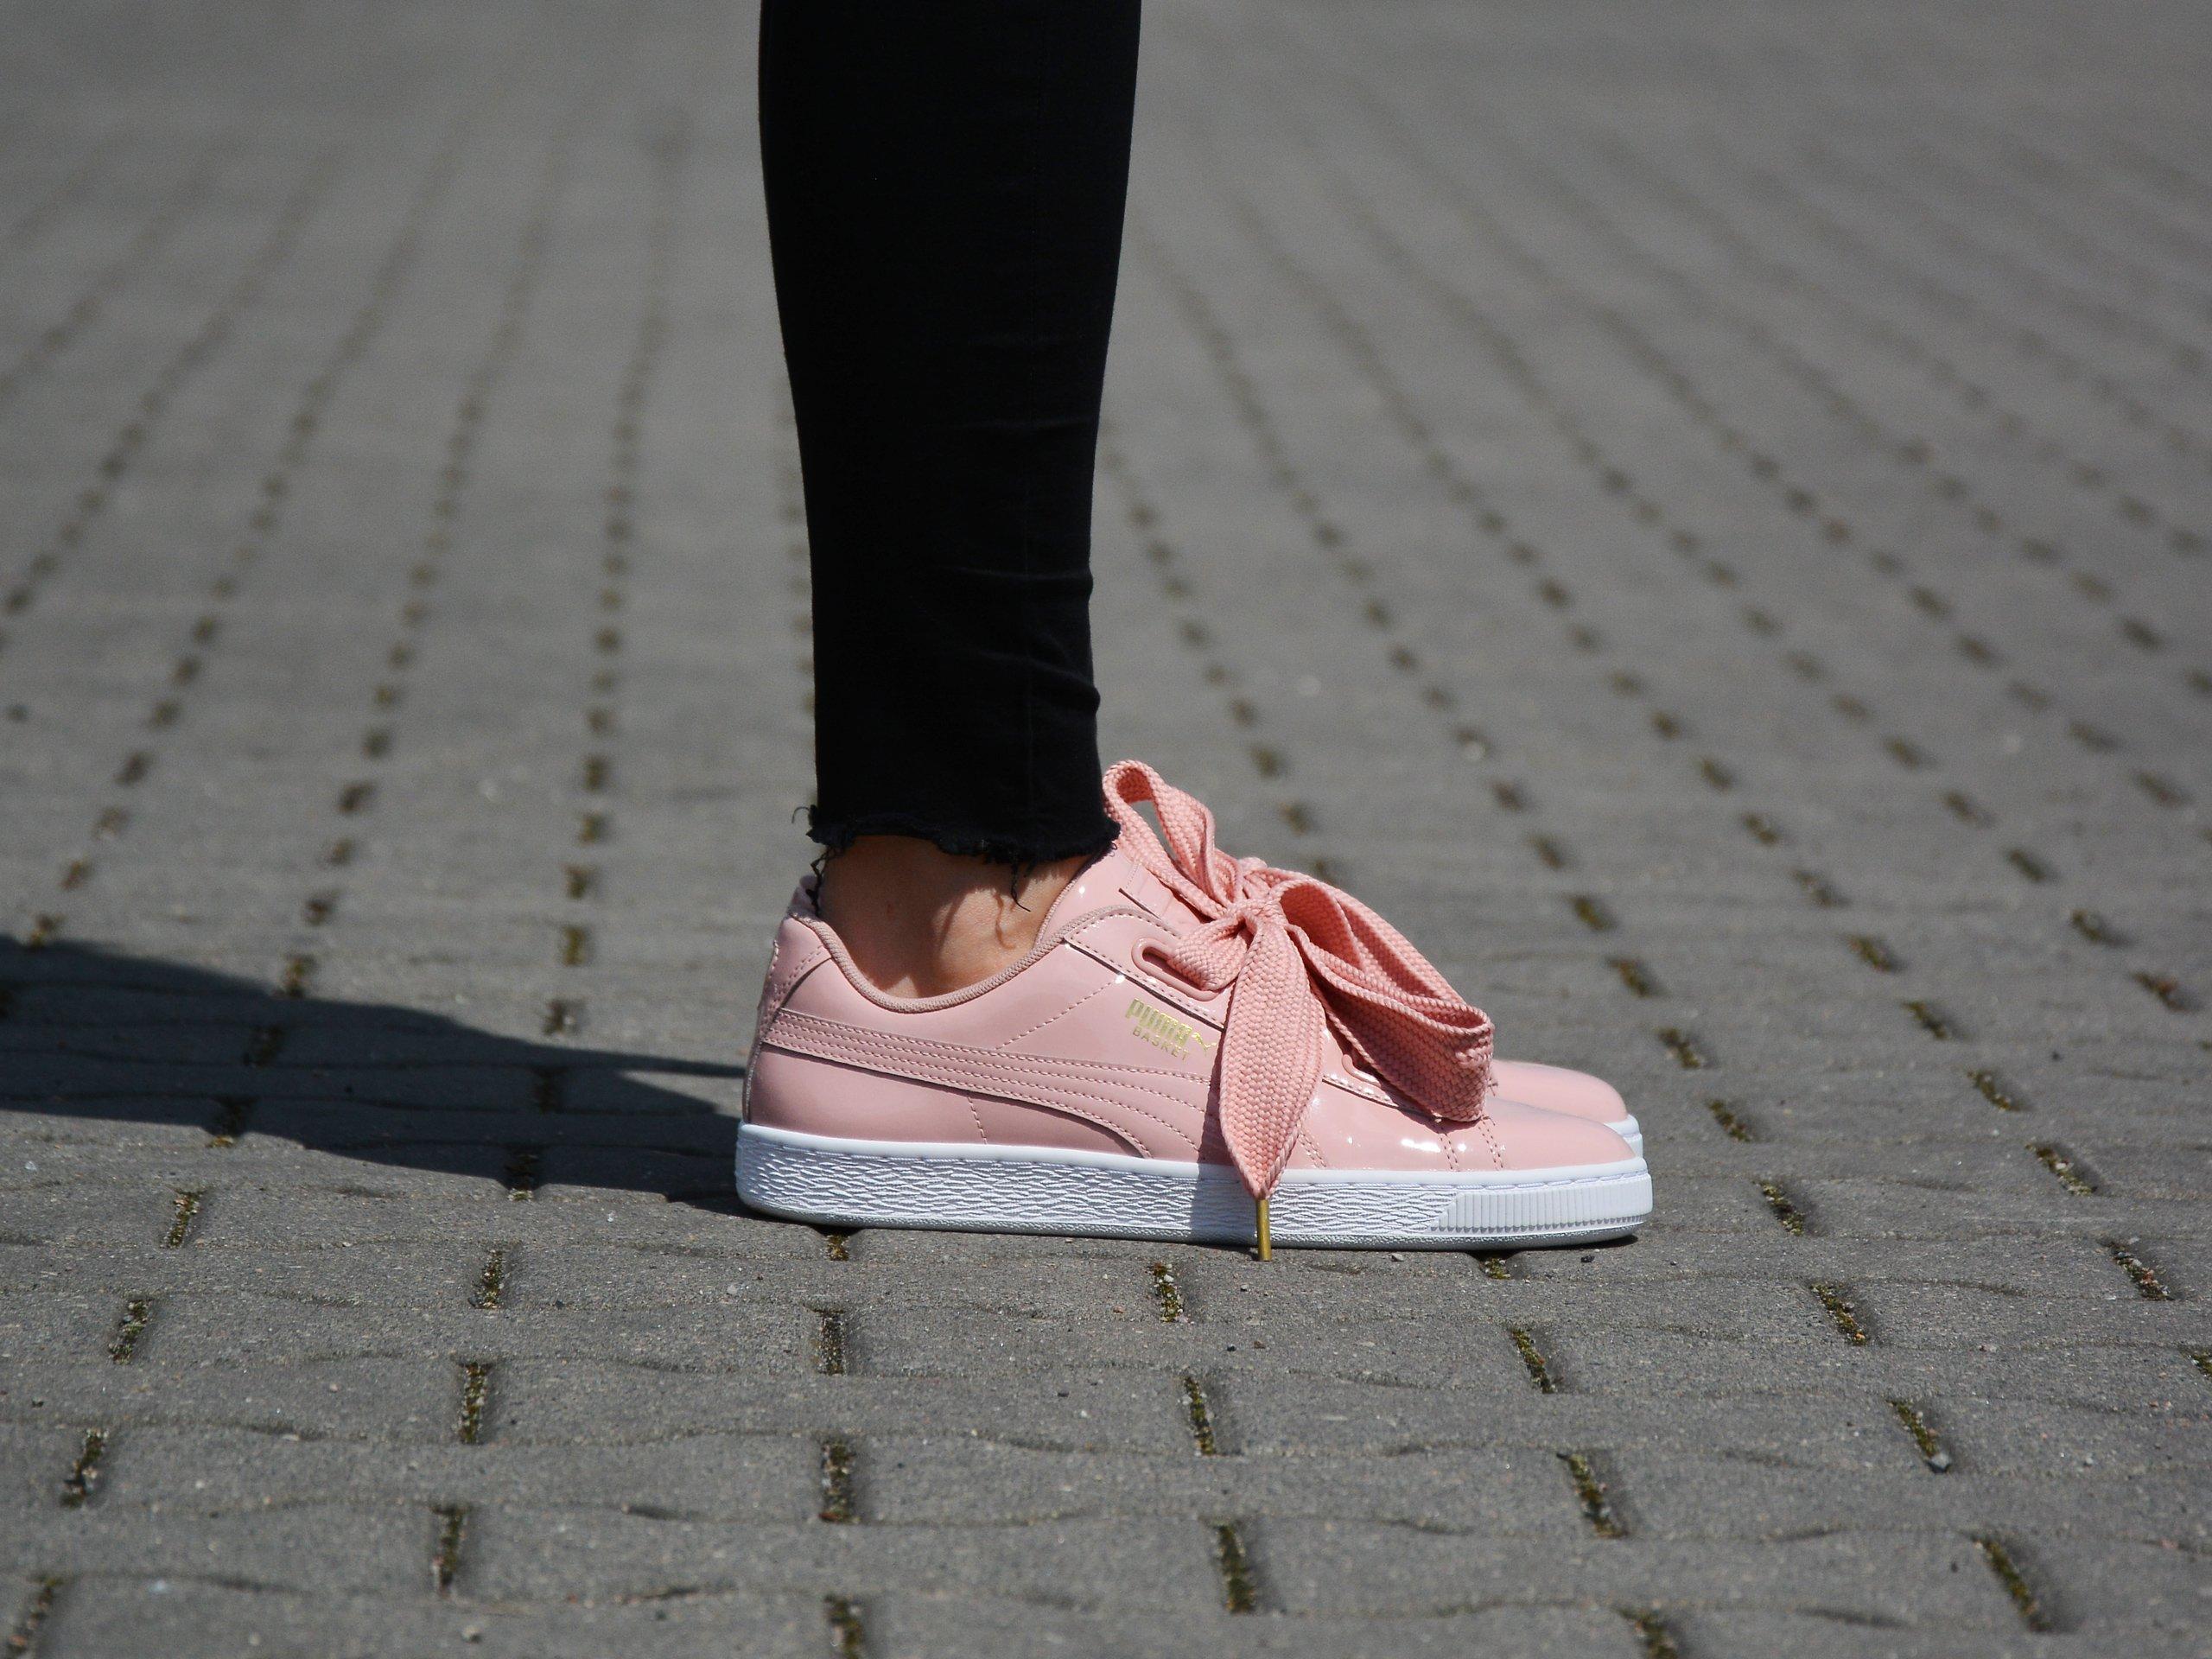 Circulo información Brisa  PUMA Suede Heart Reset (363229-01) Różowy   Womens \ Puma   Kicks Sport - a  trusted supplier of branded sports footwear